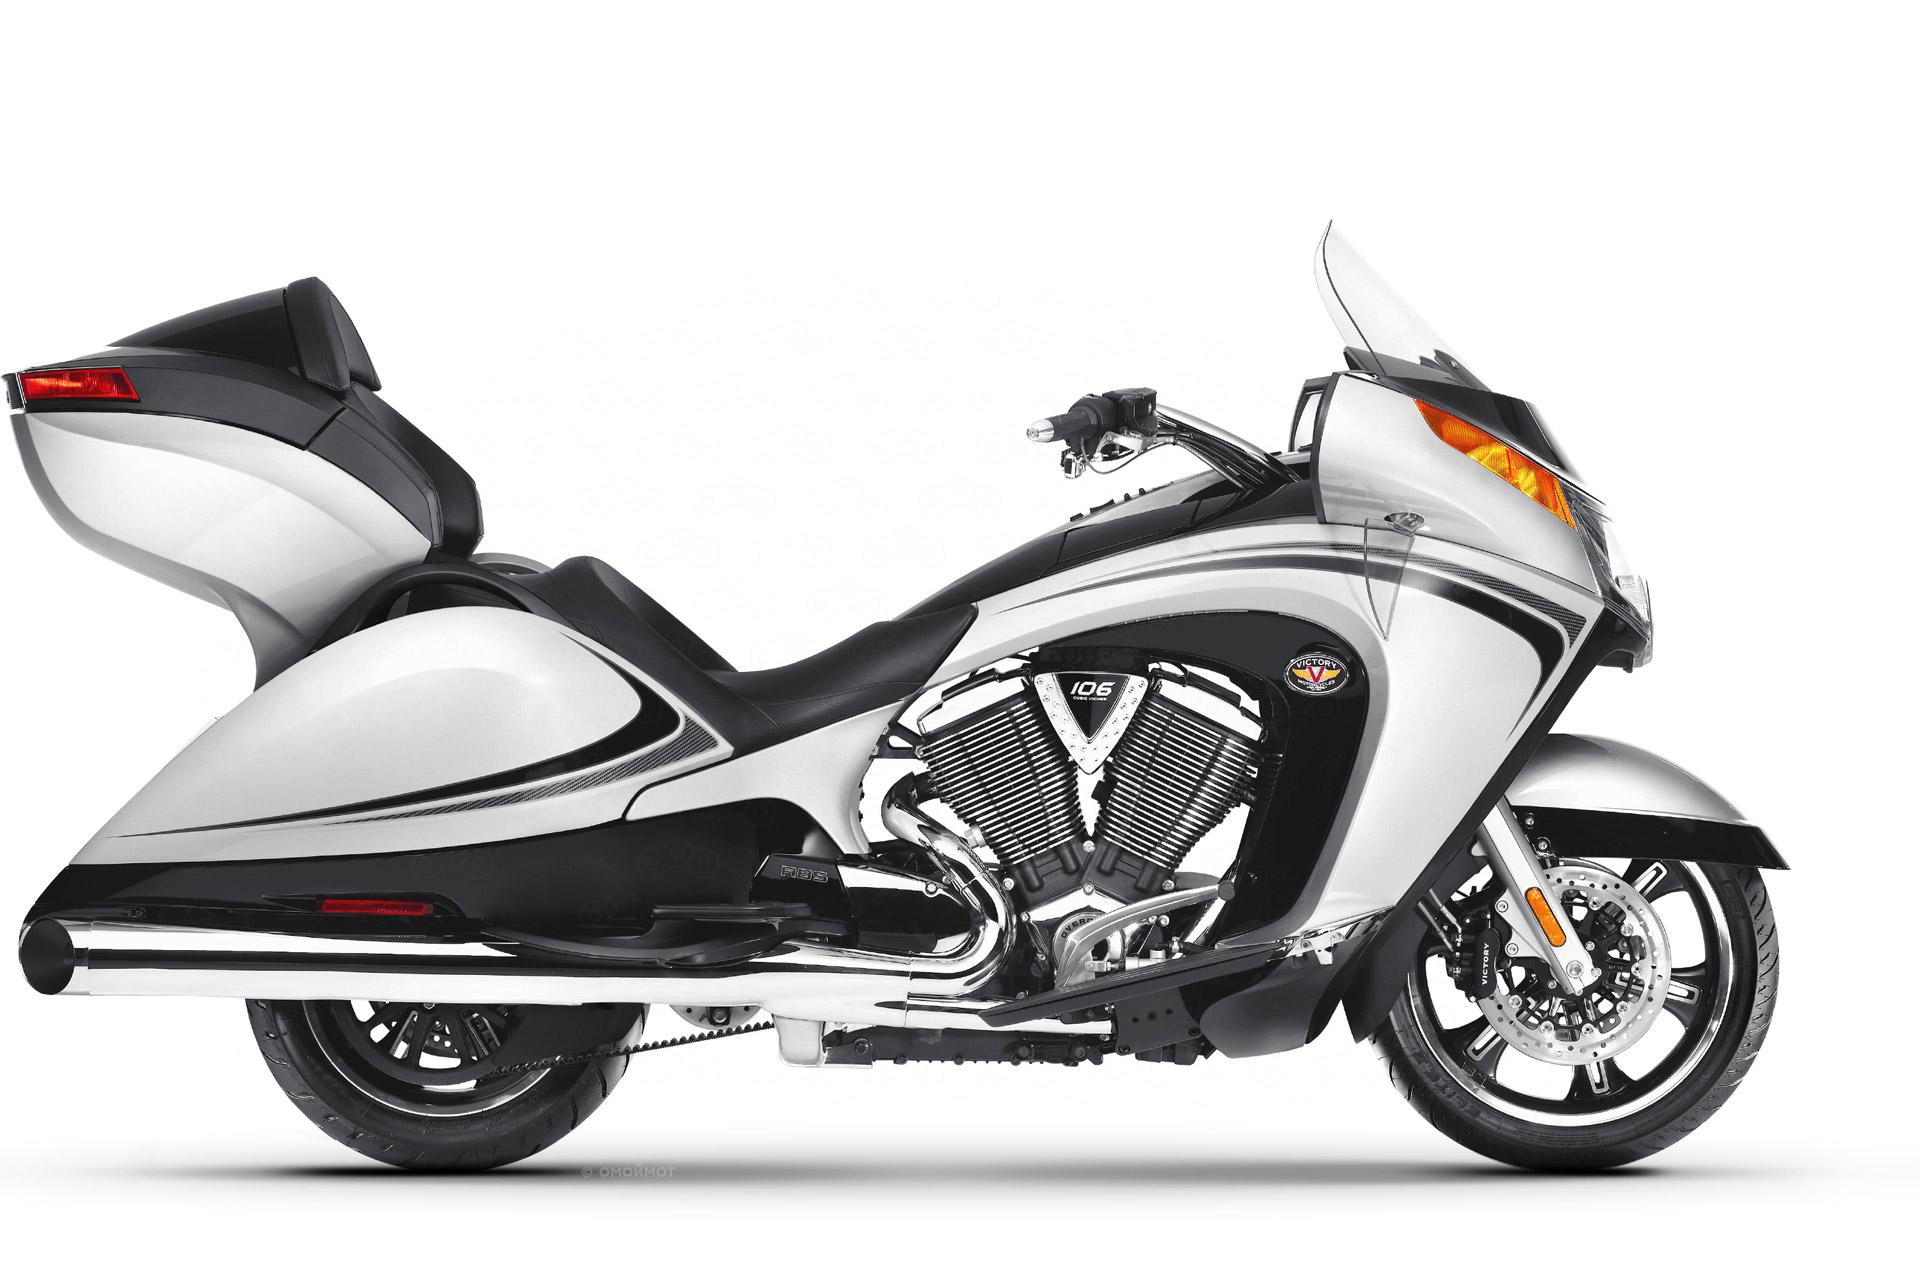 Туристический мотоцикл Victory Vision Tour в каталоге Омоймот.